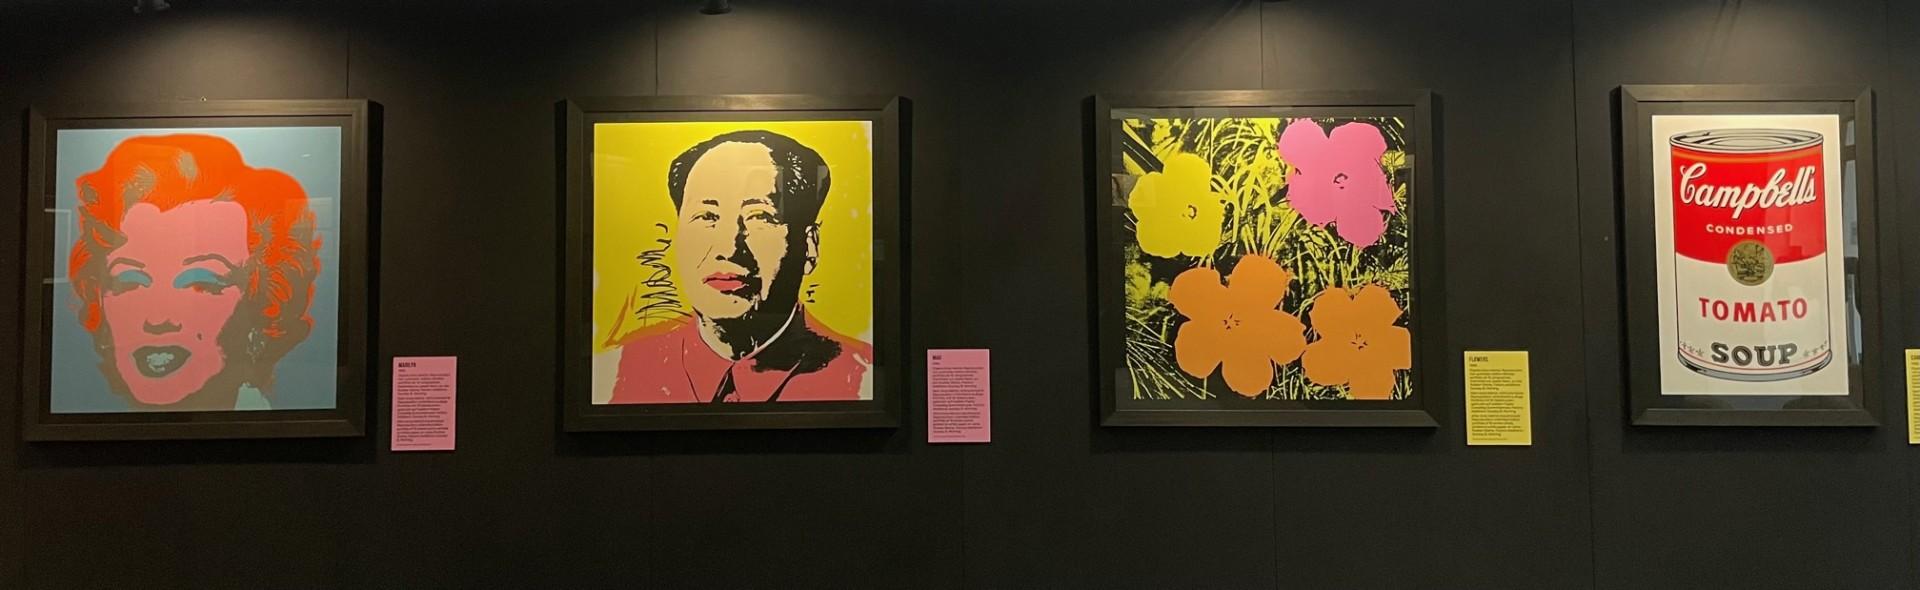 <br><br>Andy Warhol – Pop Art Identities